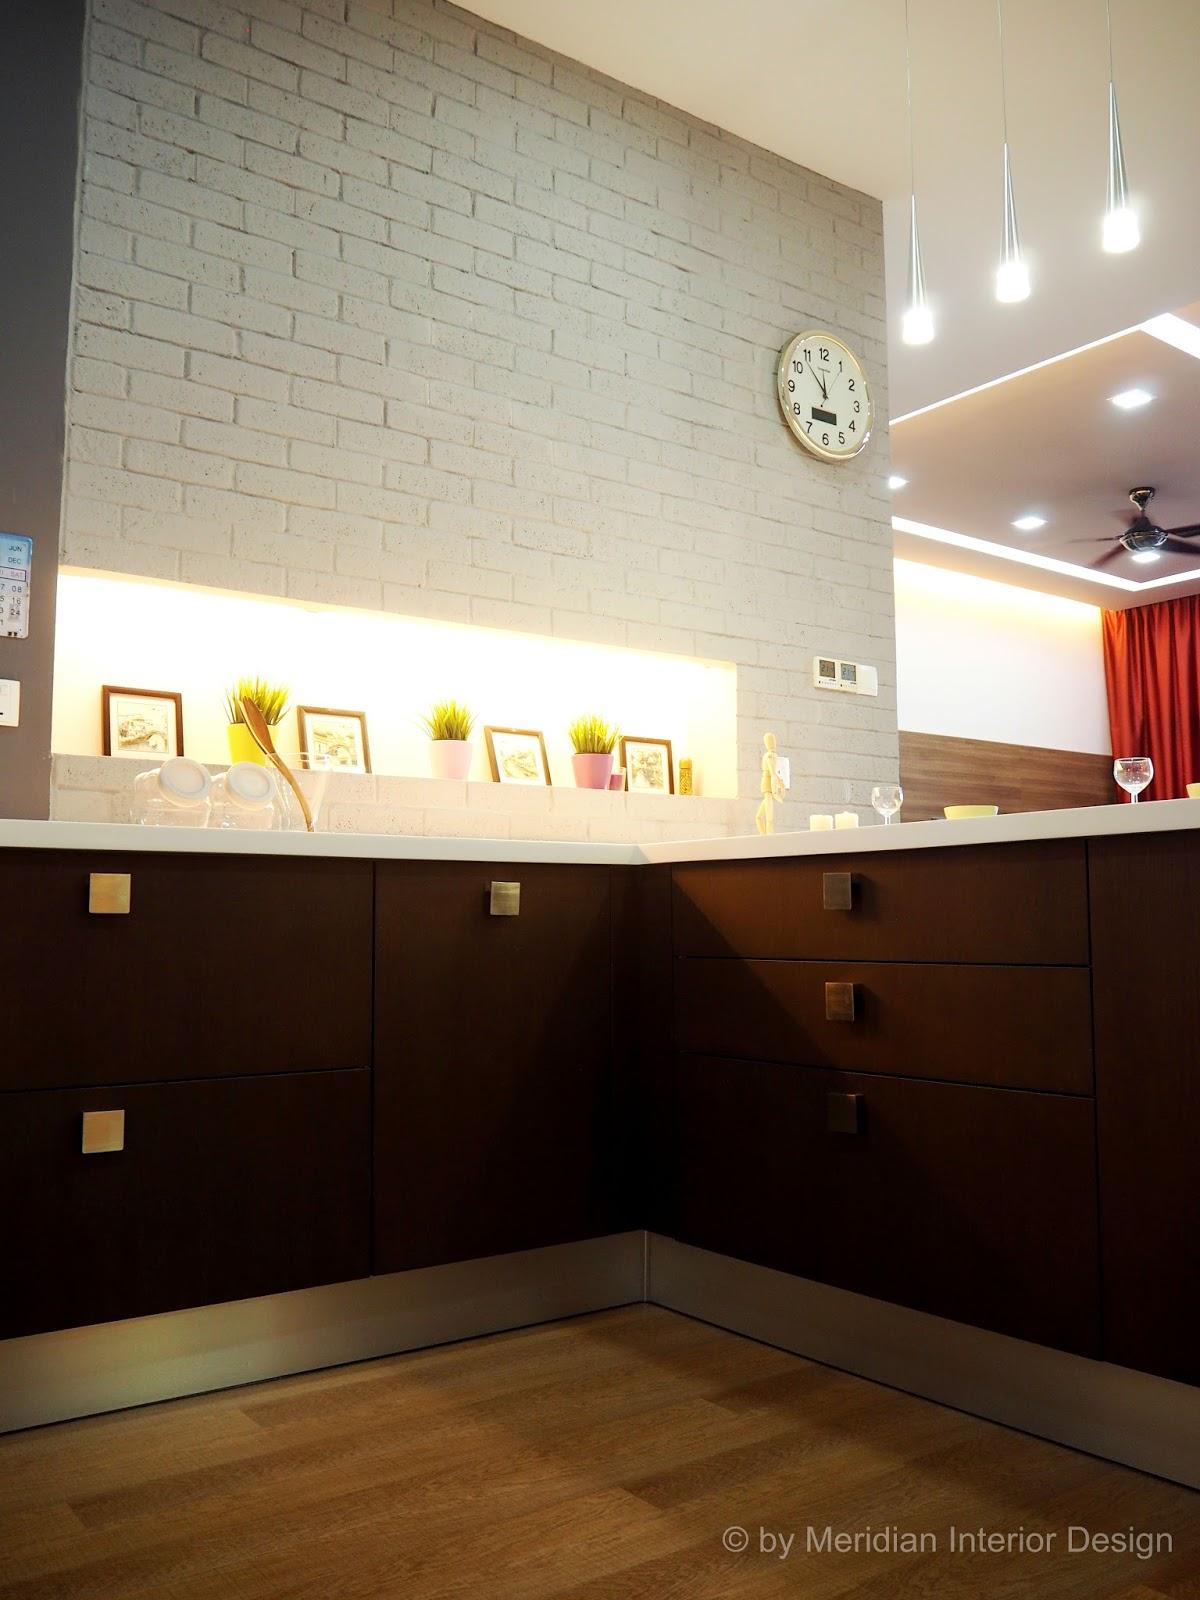 Inspiration through creative interior designs pact Kitchen